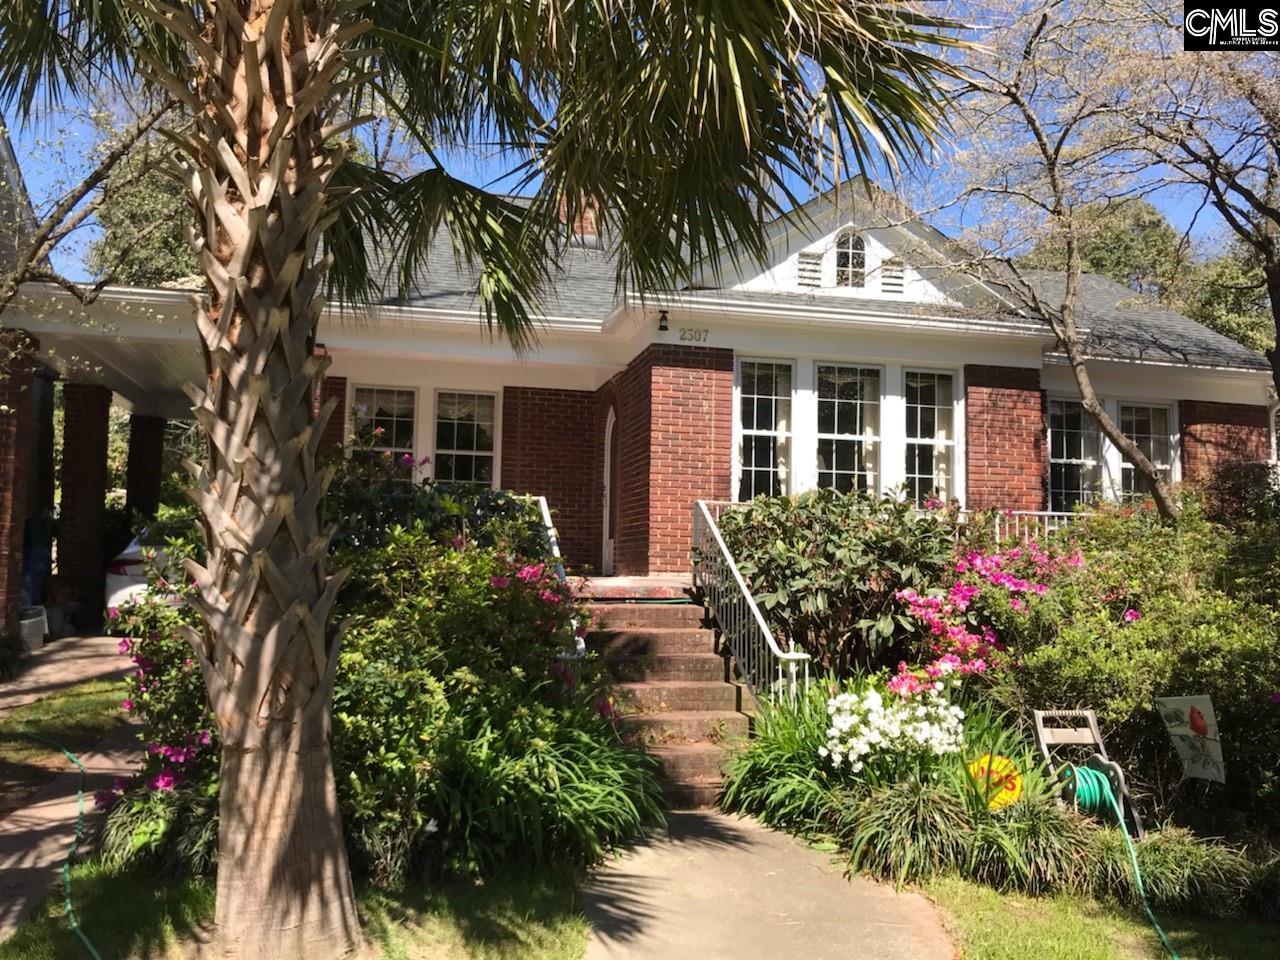 2307 Blossom Columbia, SC 29205